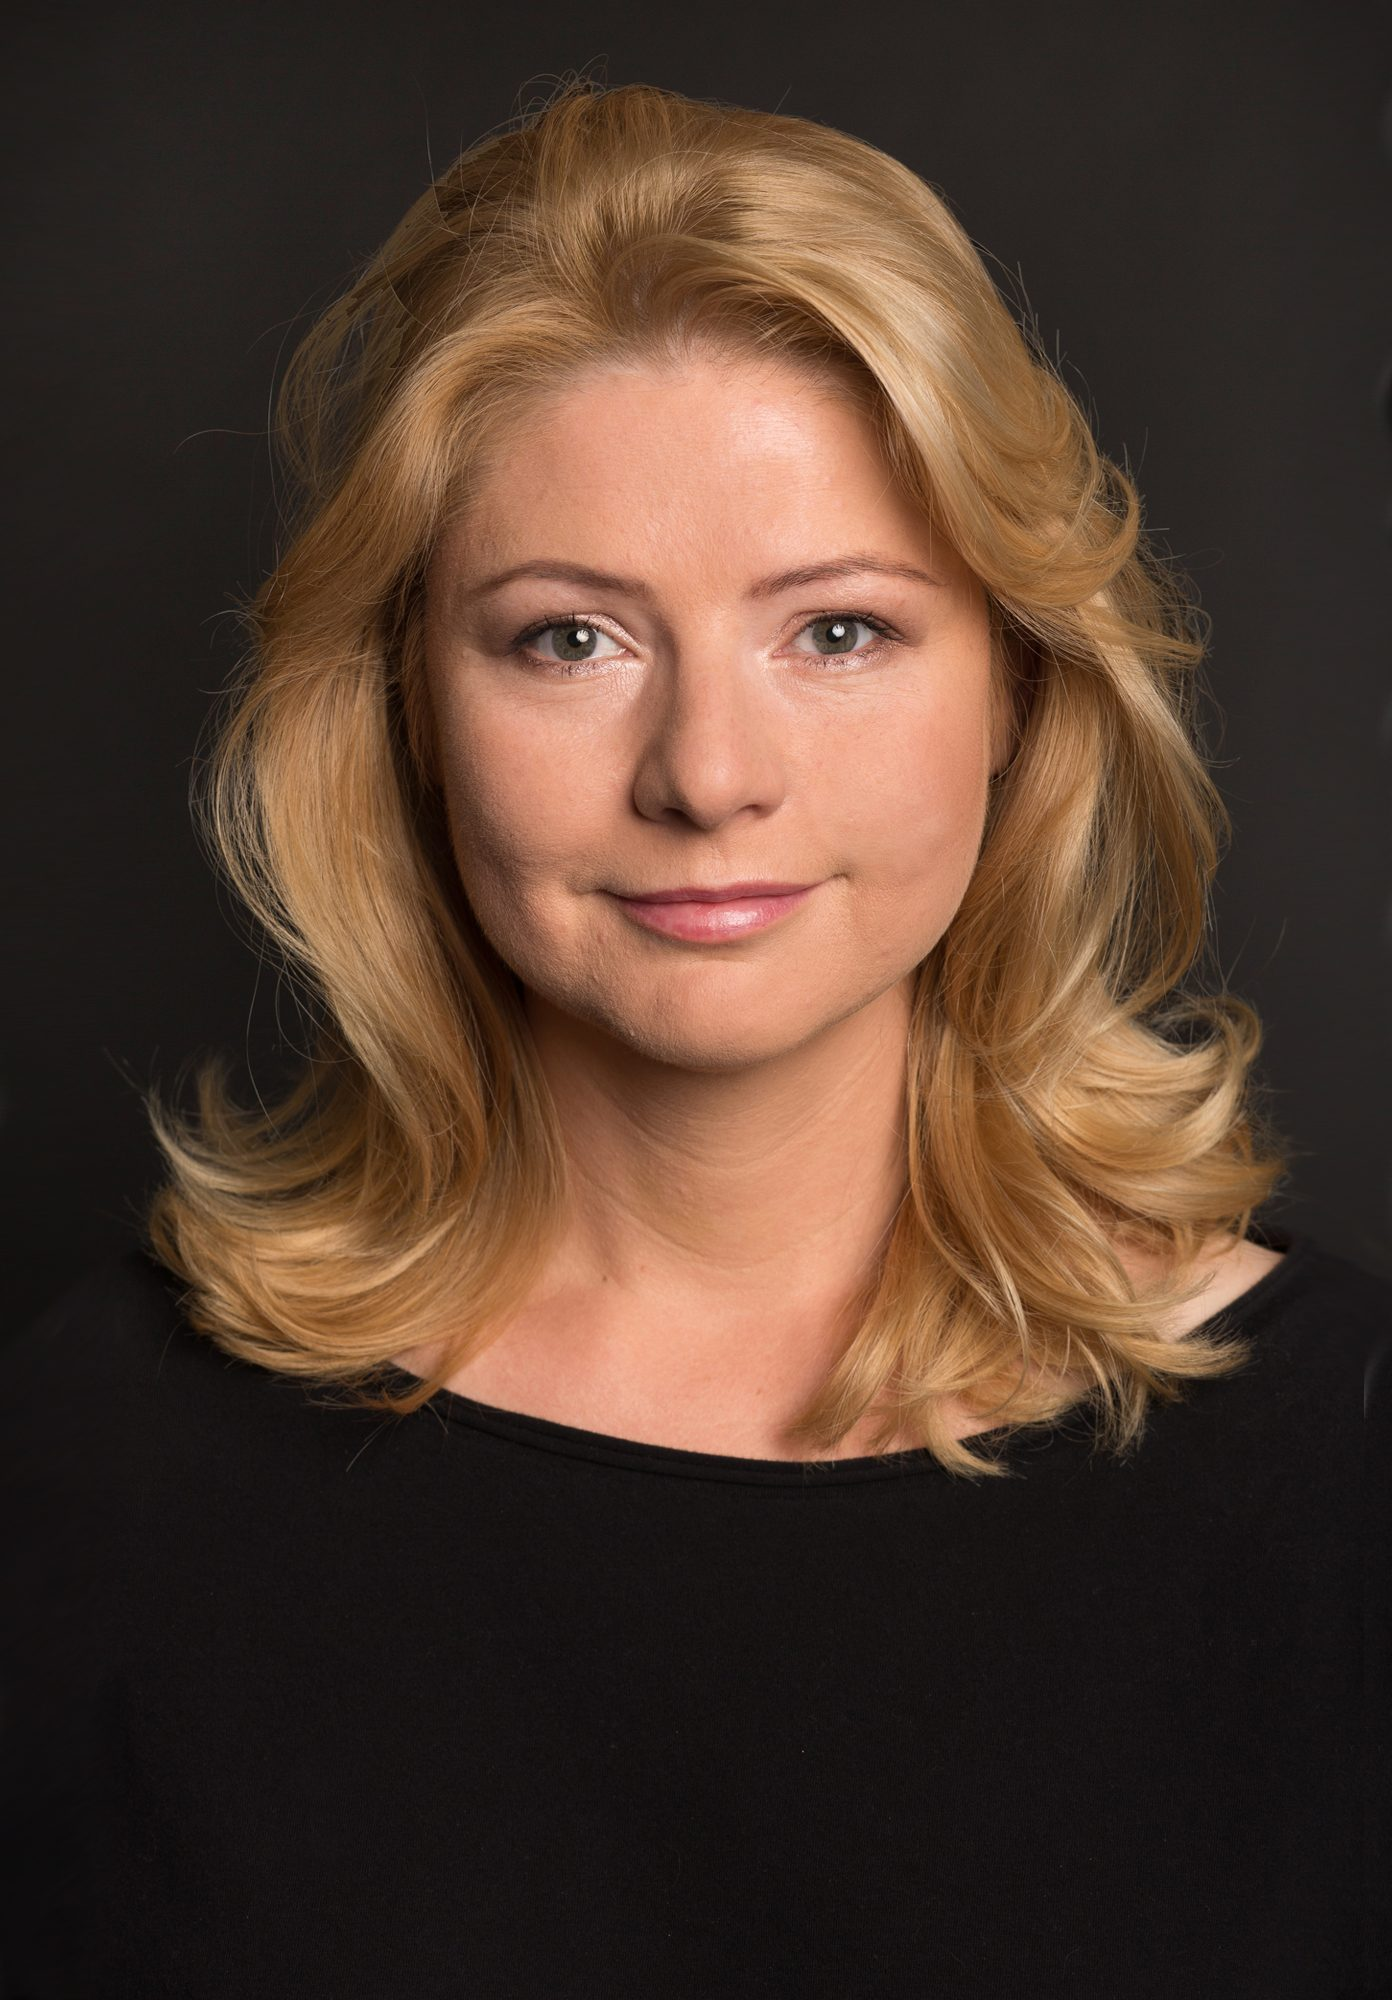 Barbara Kałużna